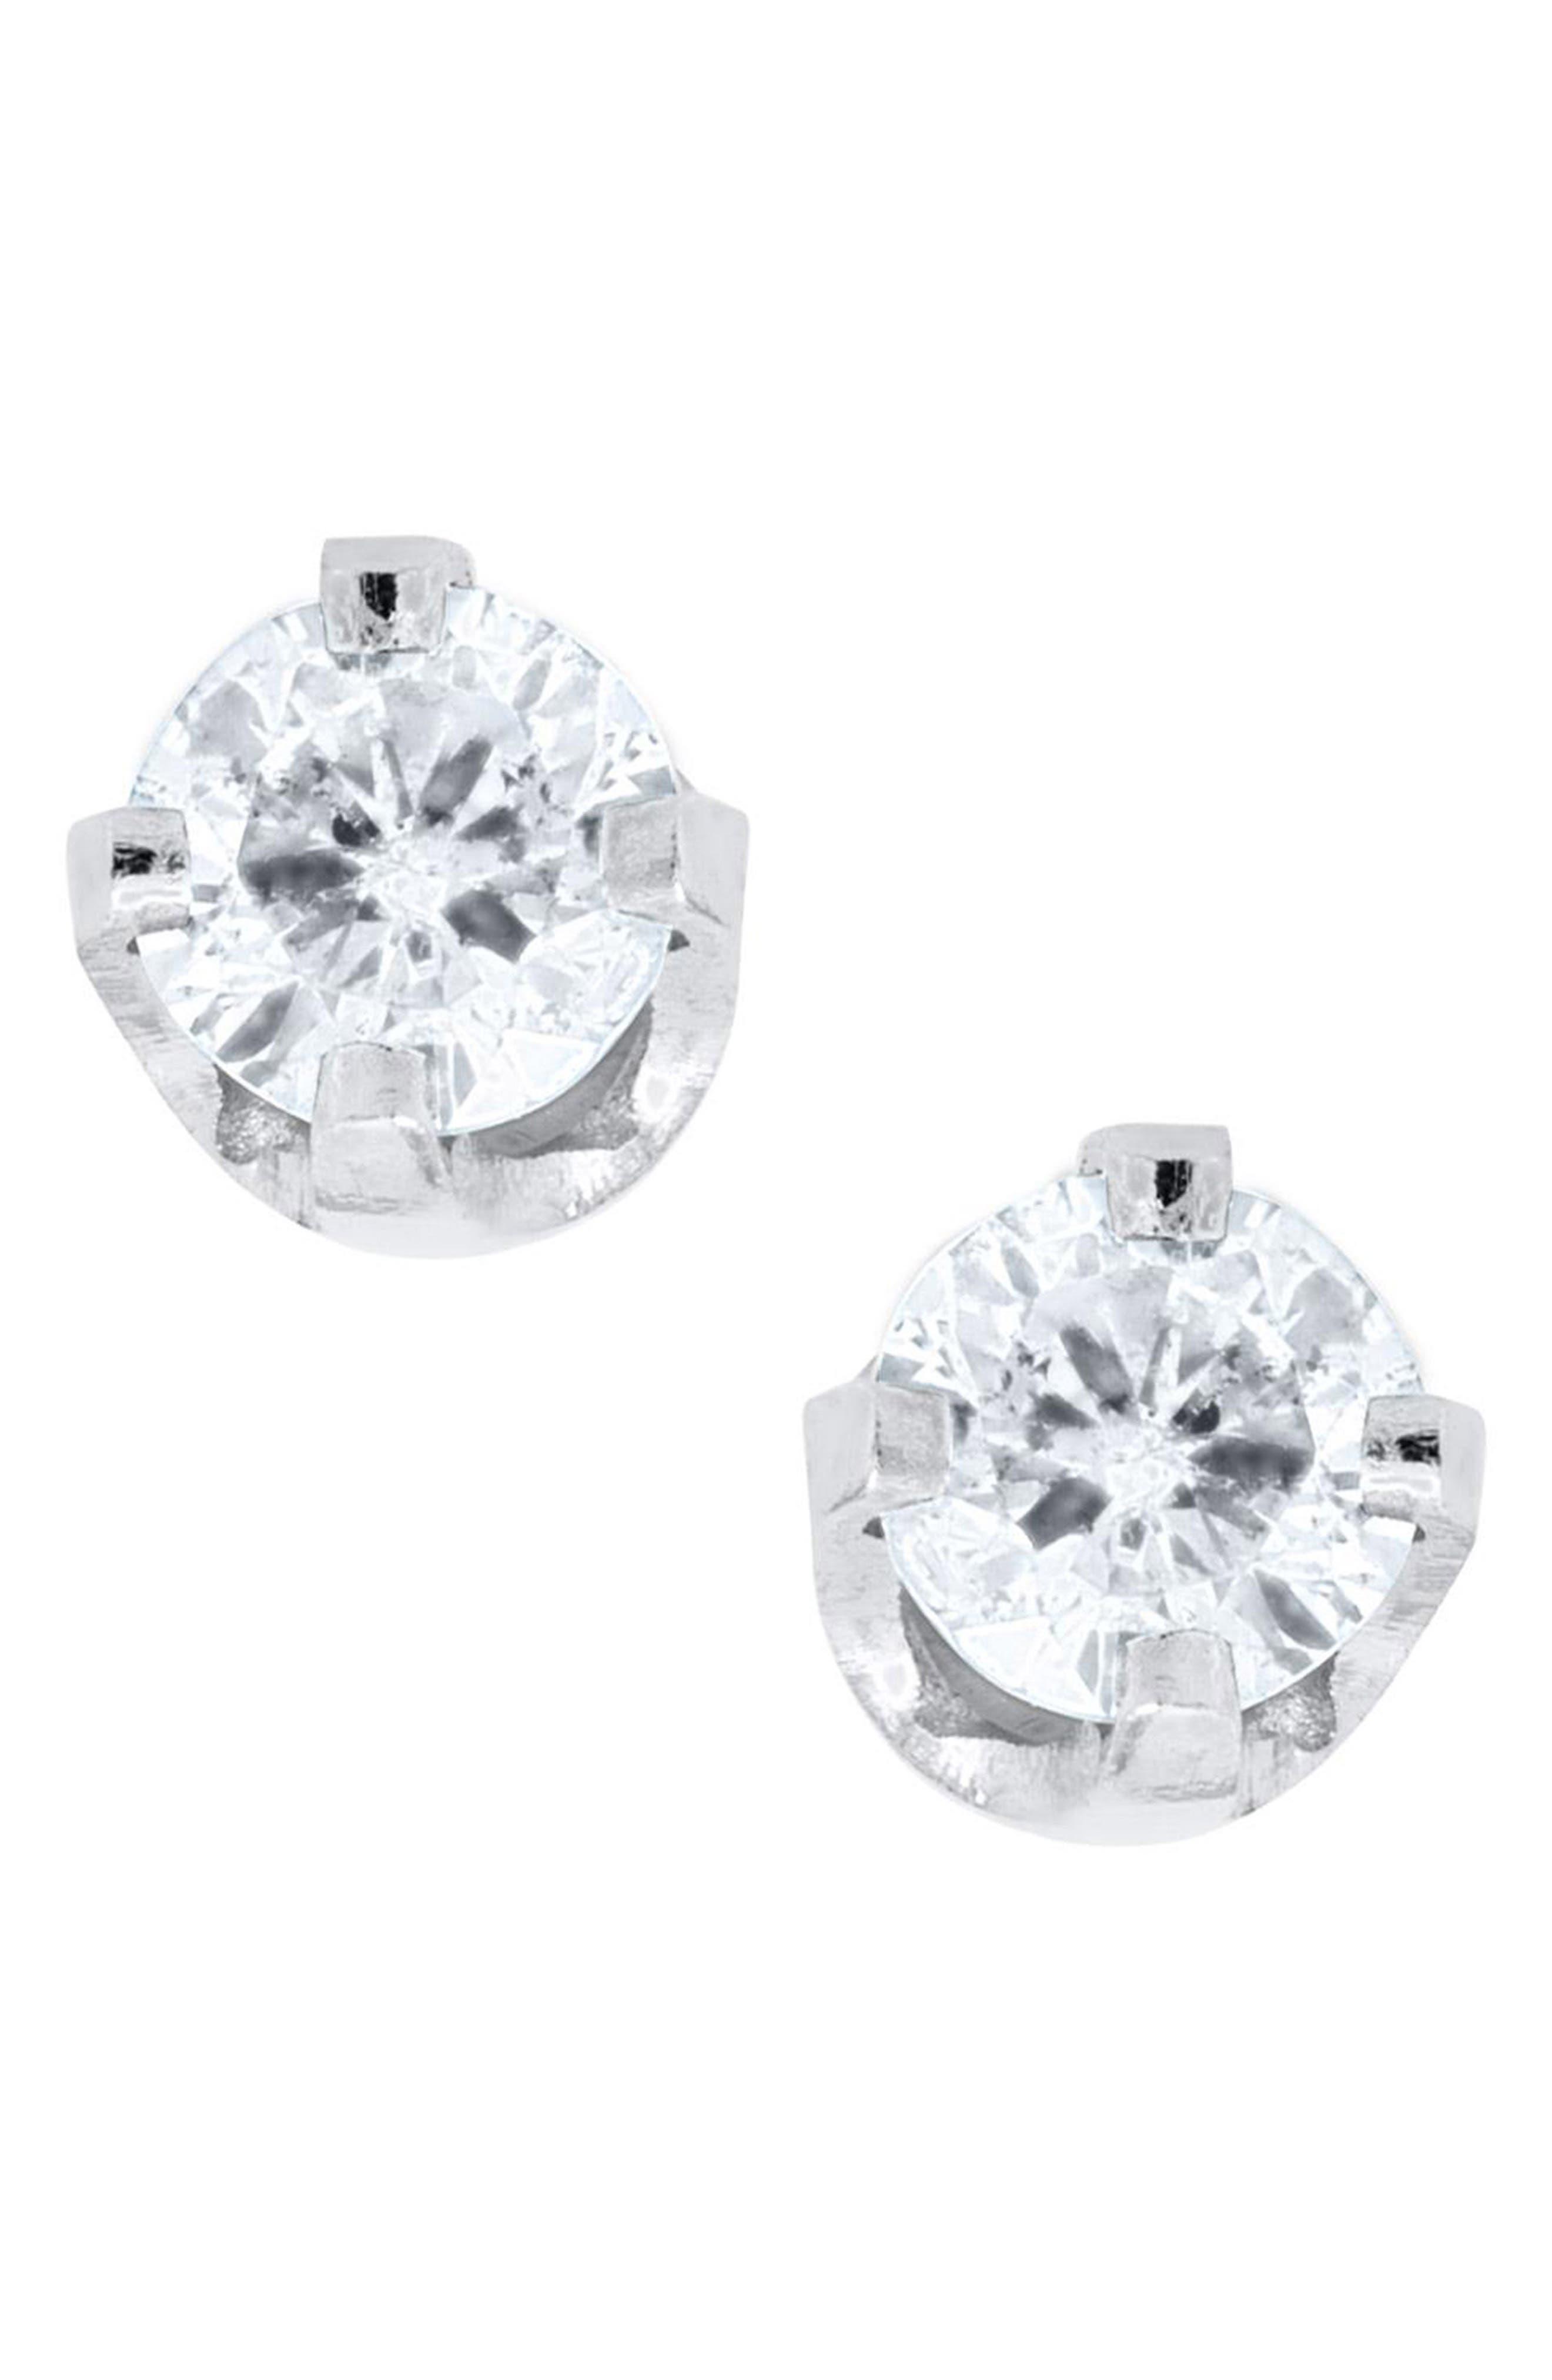 14k White Gold & Diamond Earrings,                             Main thumbnail 1, color,                             White